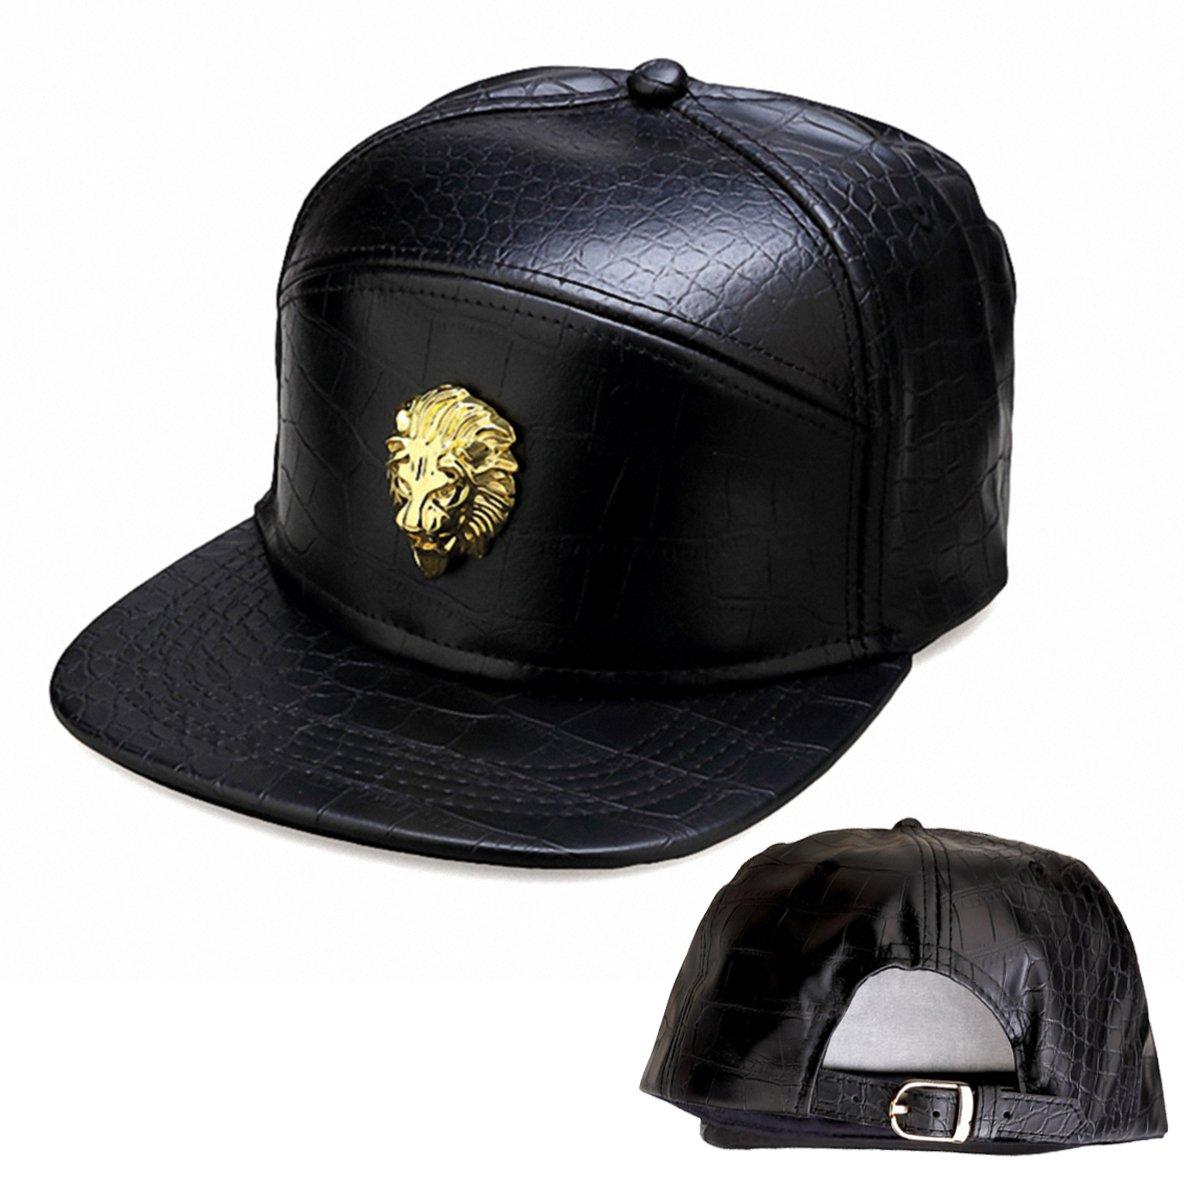 Flat Bill Snapback Baseball Punk Cap Hat nukic Unisex Leder Lion Head Kappe Baseball verstellbar